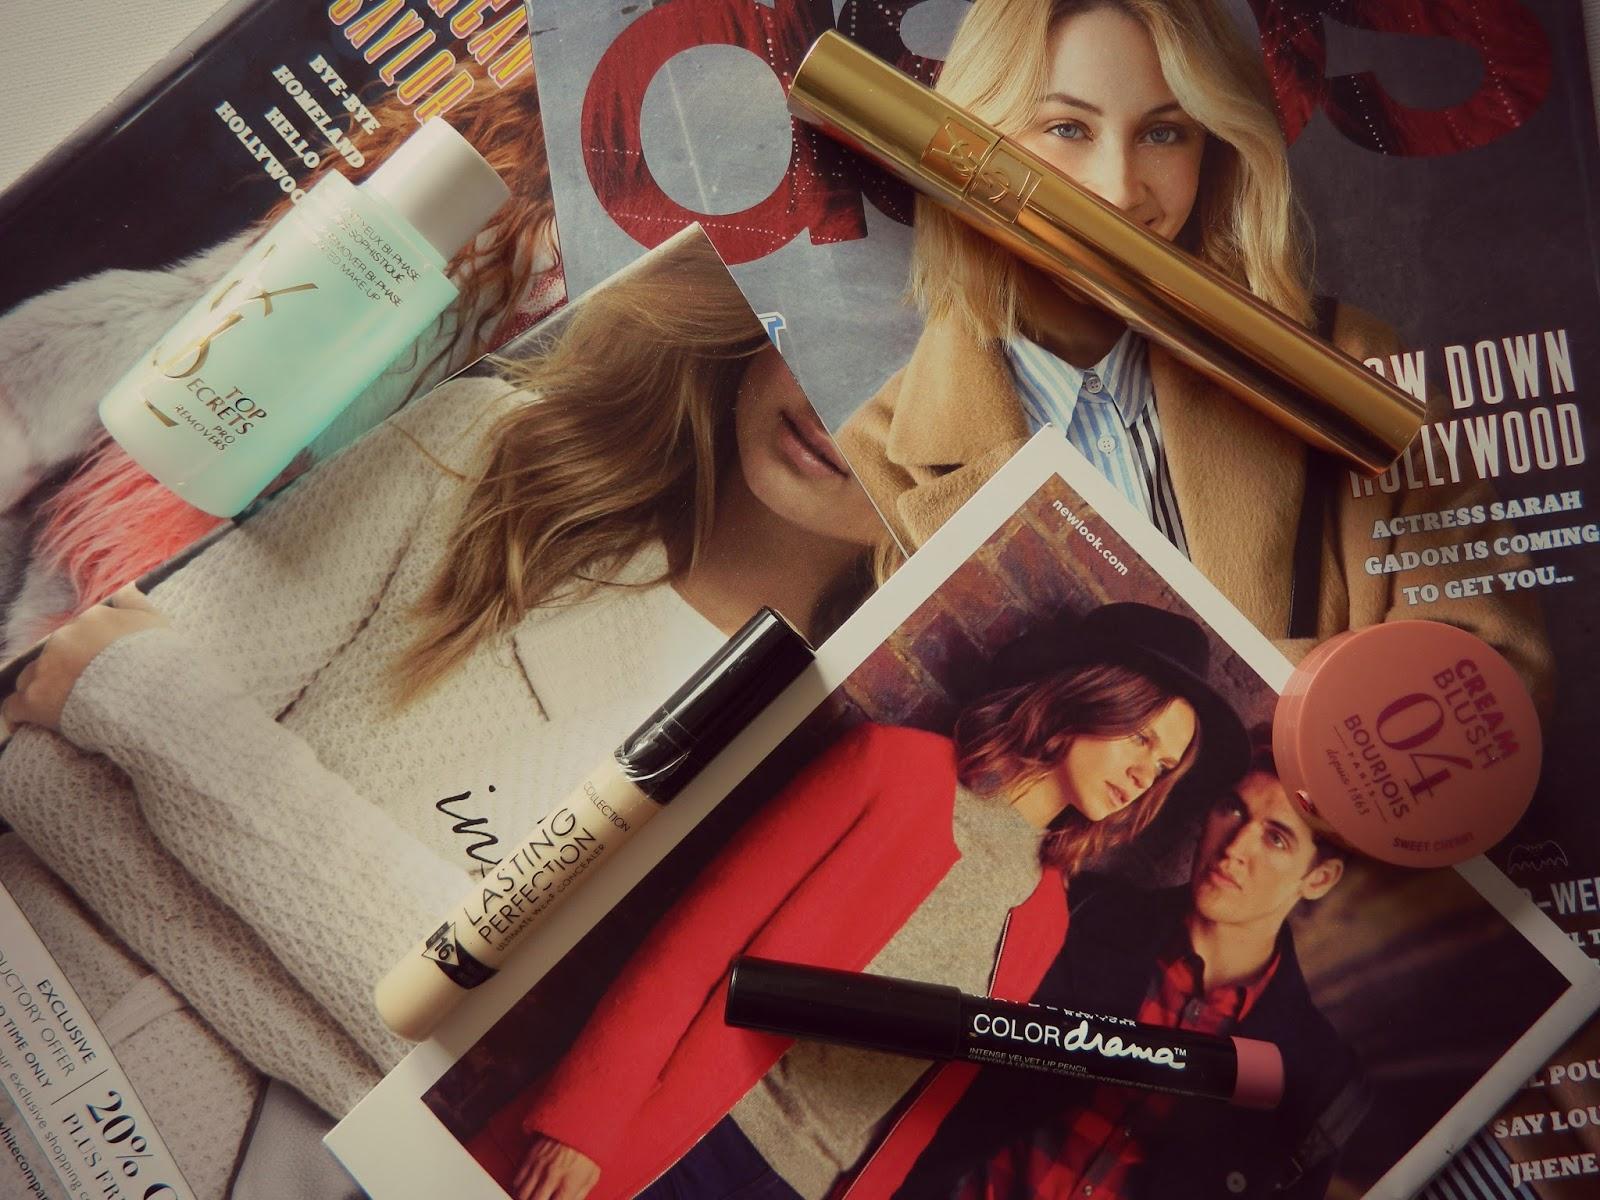 Maybelline Color Drama lipstick, YSL mascara, Bourjois cream blush makeup purchases